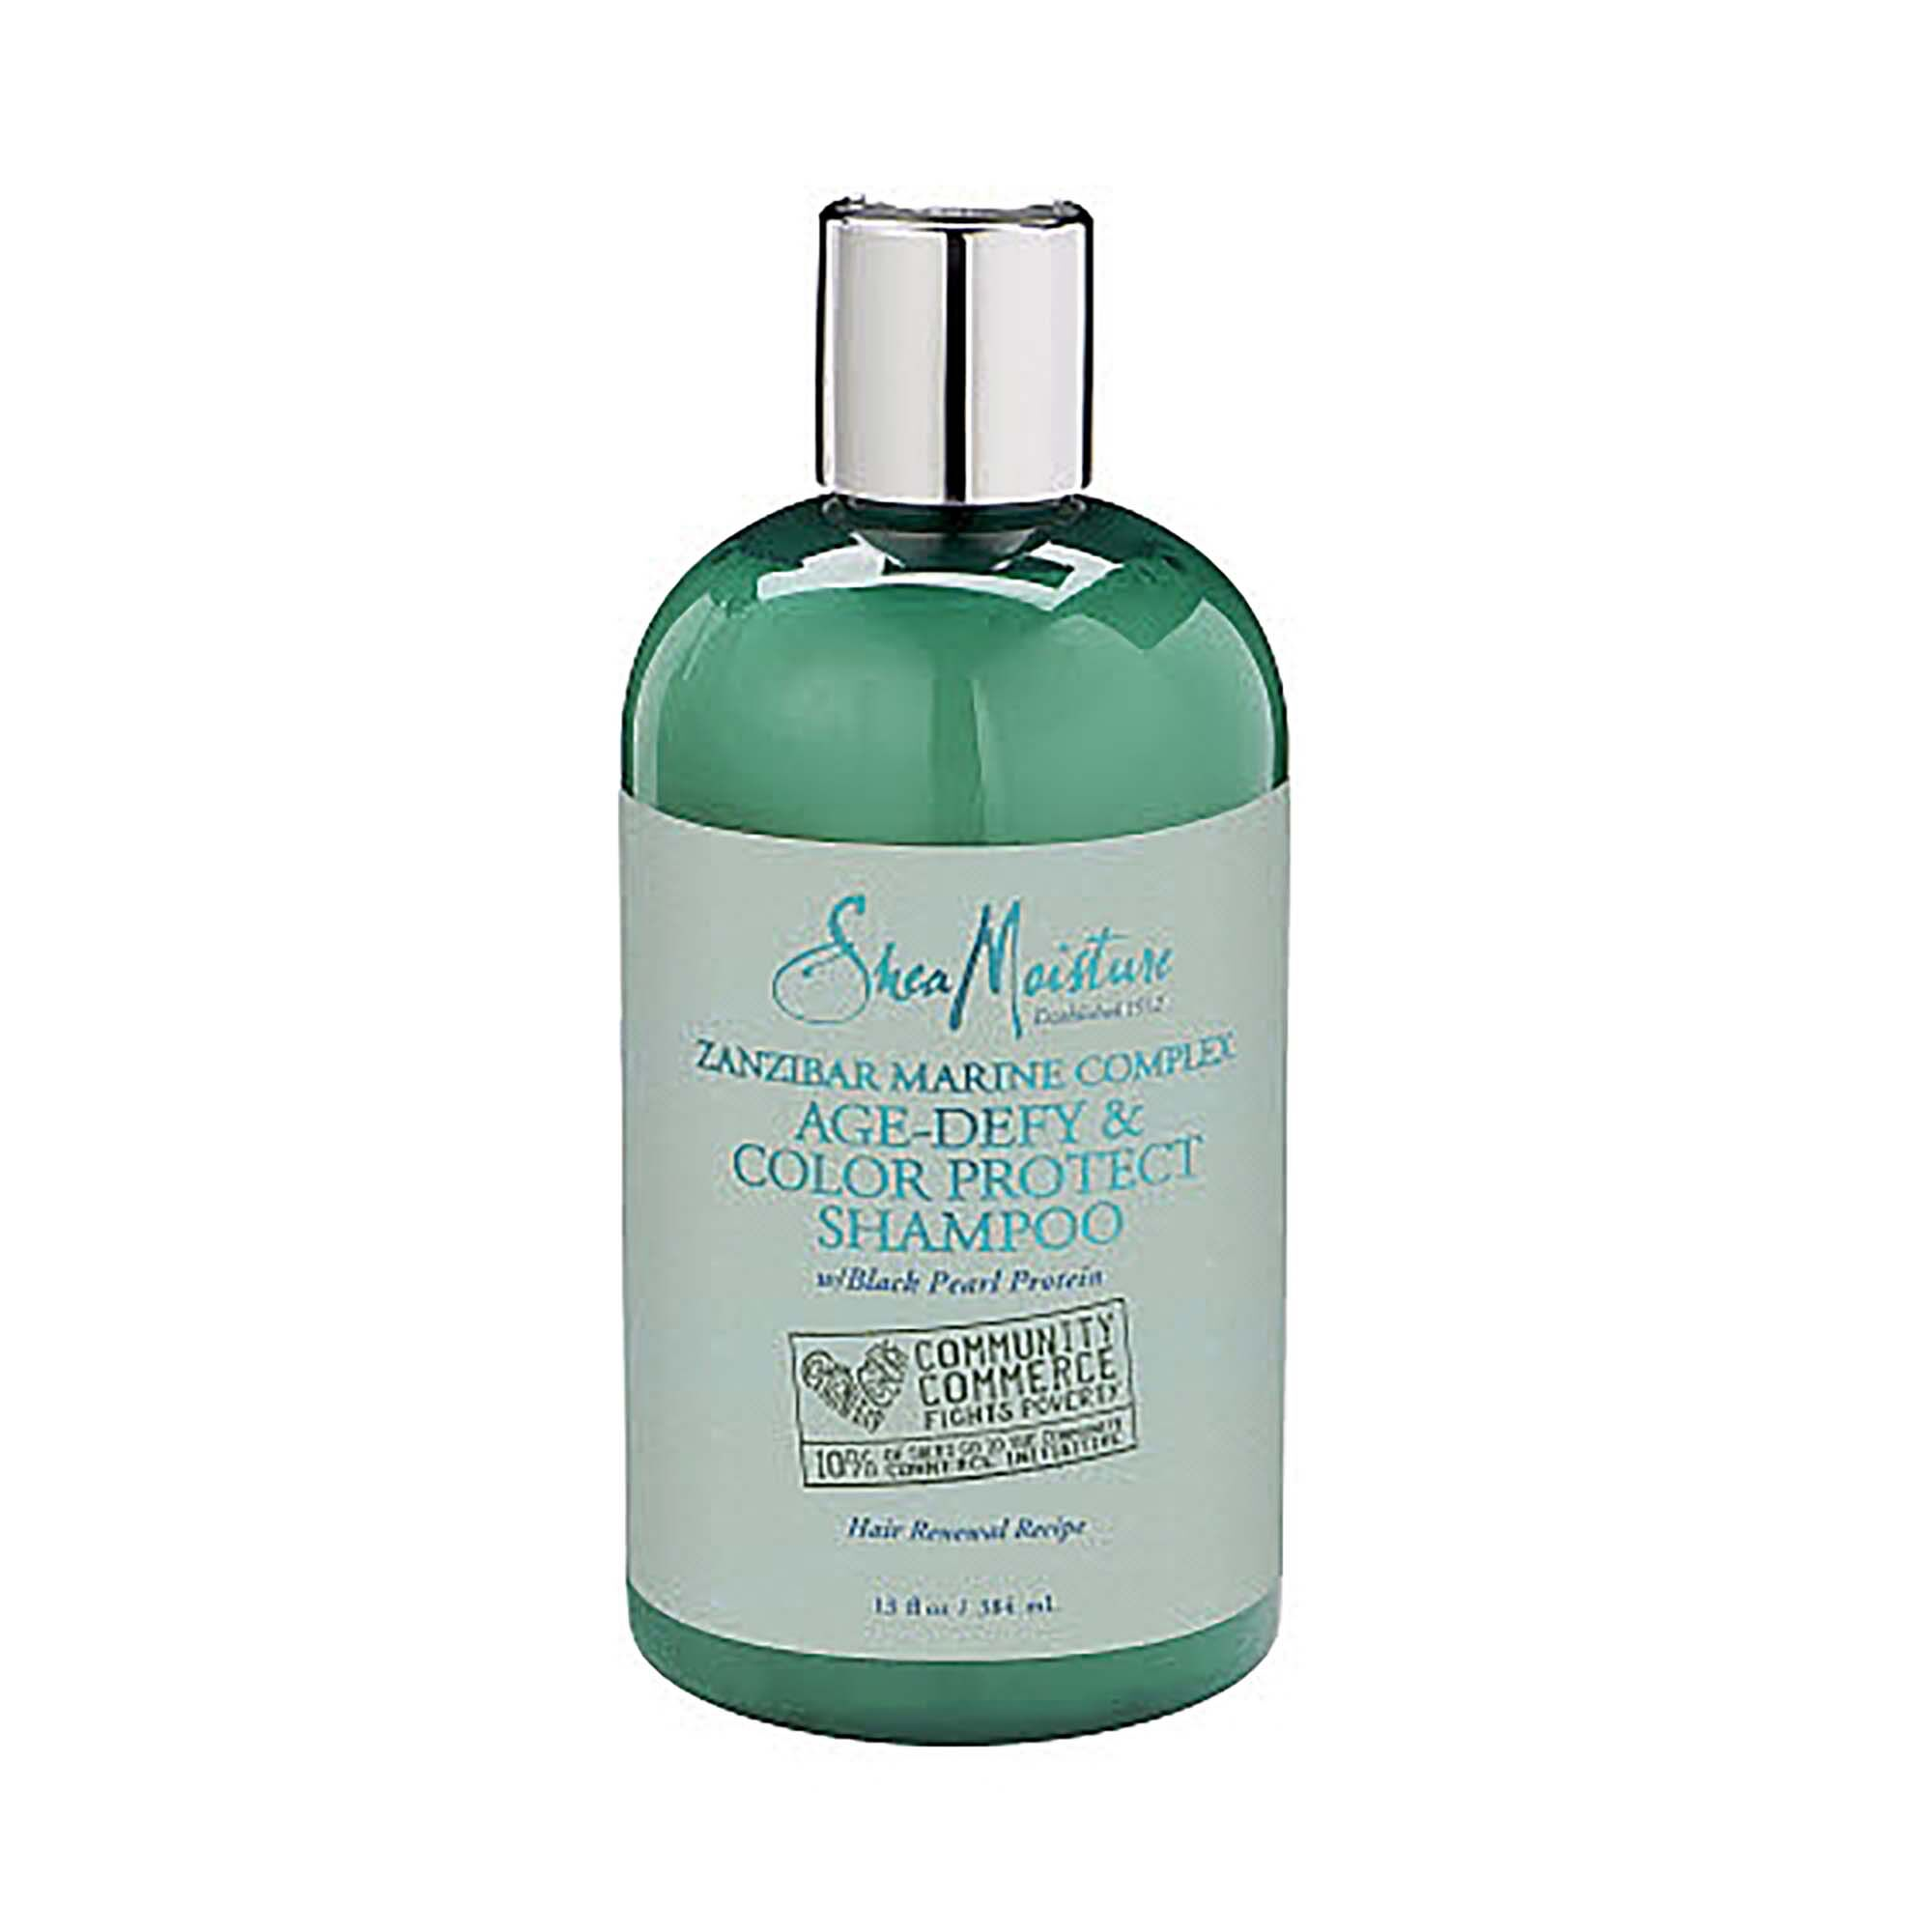 Color Extend Shampoo - 13 Oz(S) - Shea Moisture - Personal Care